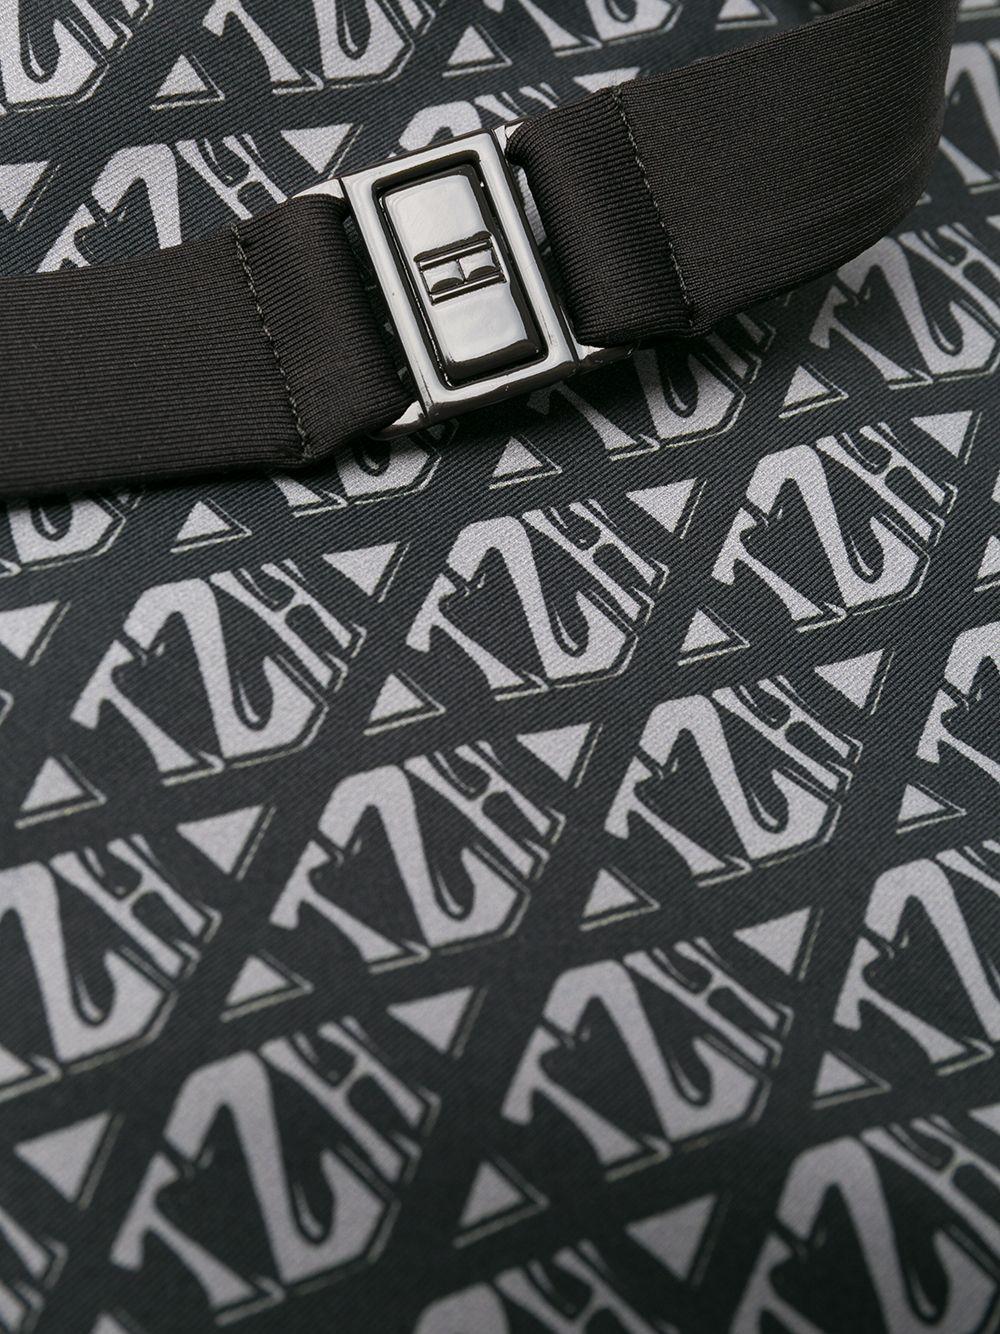 TOMMY HILFIGER | Tommy Hilfiger плавки бикини с логотипом | Clouty